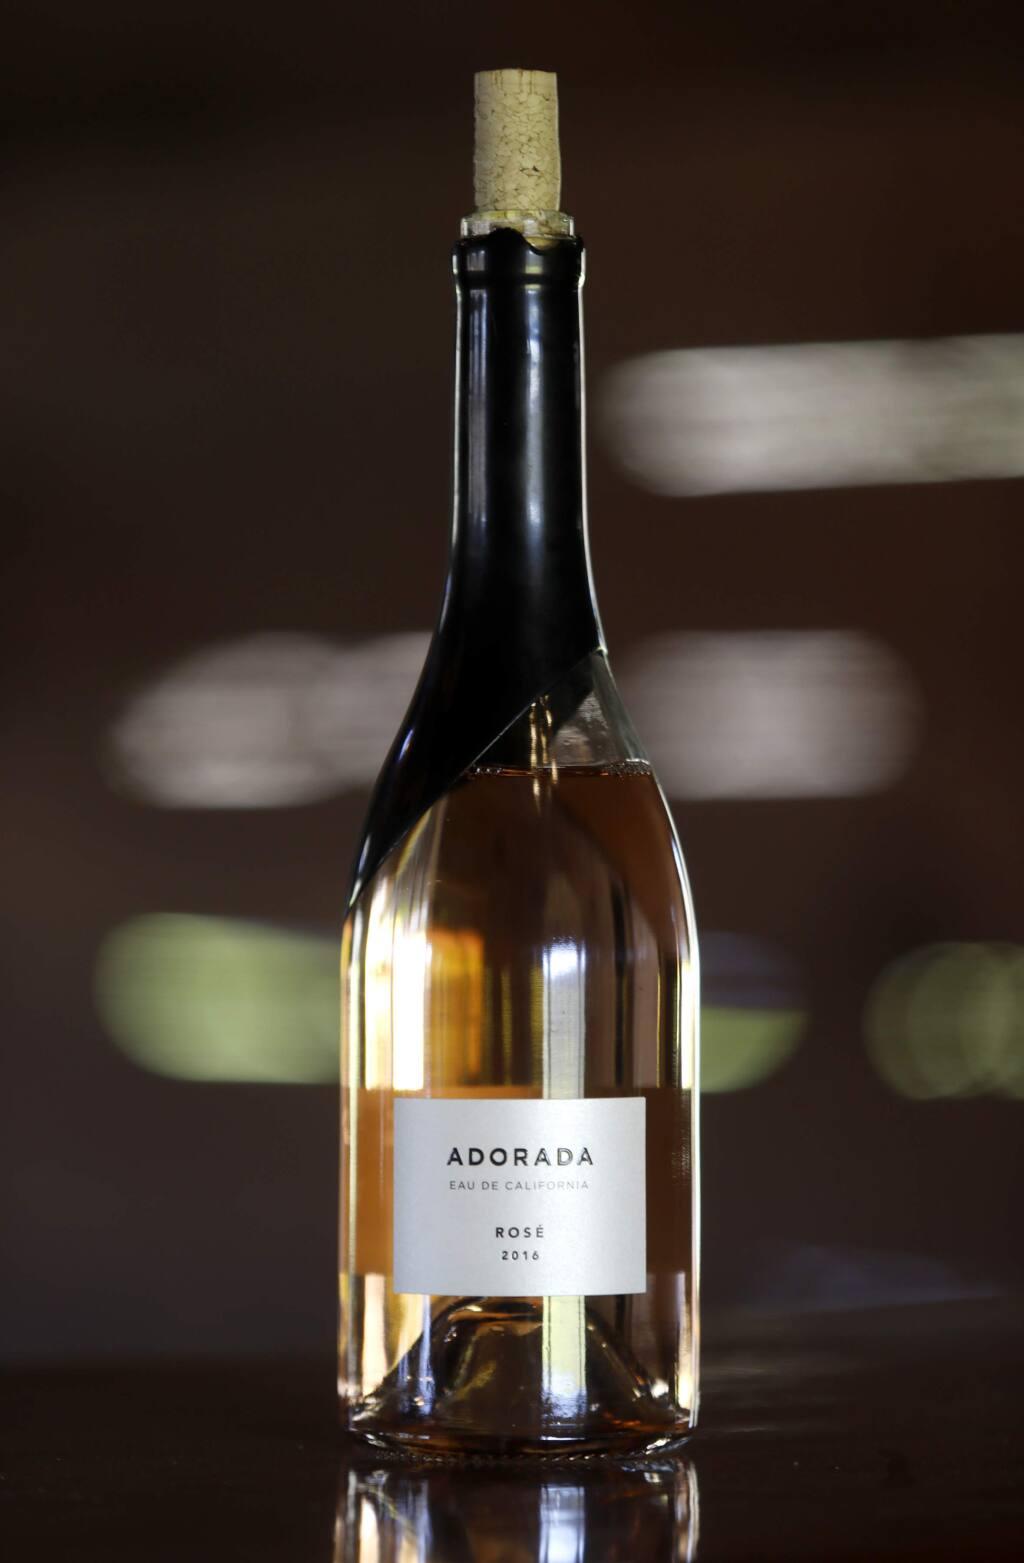 2016 Adorada rose wine at Fetzer Vineyards in Hopland, on Thursday, February 8, 2018. (BETH SCHLANKER/ The Press Democrat)